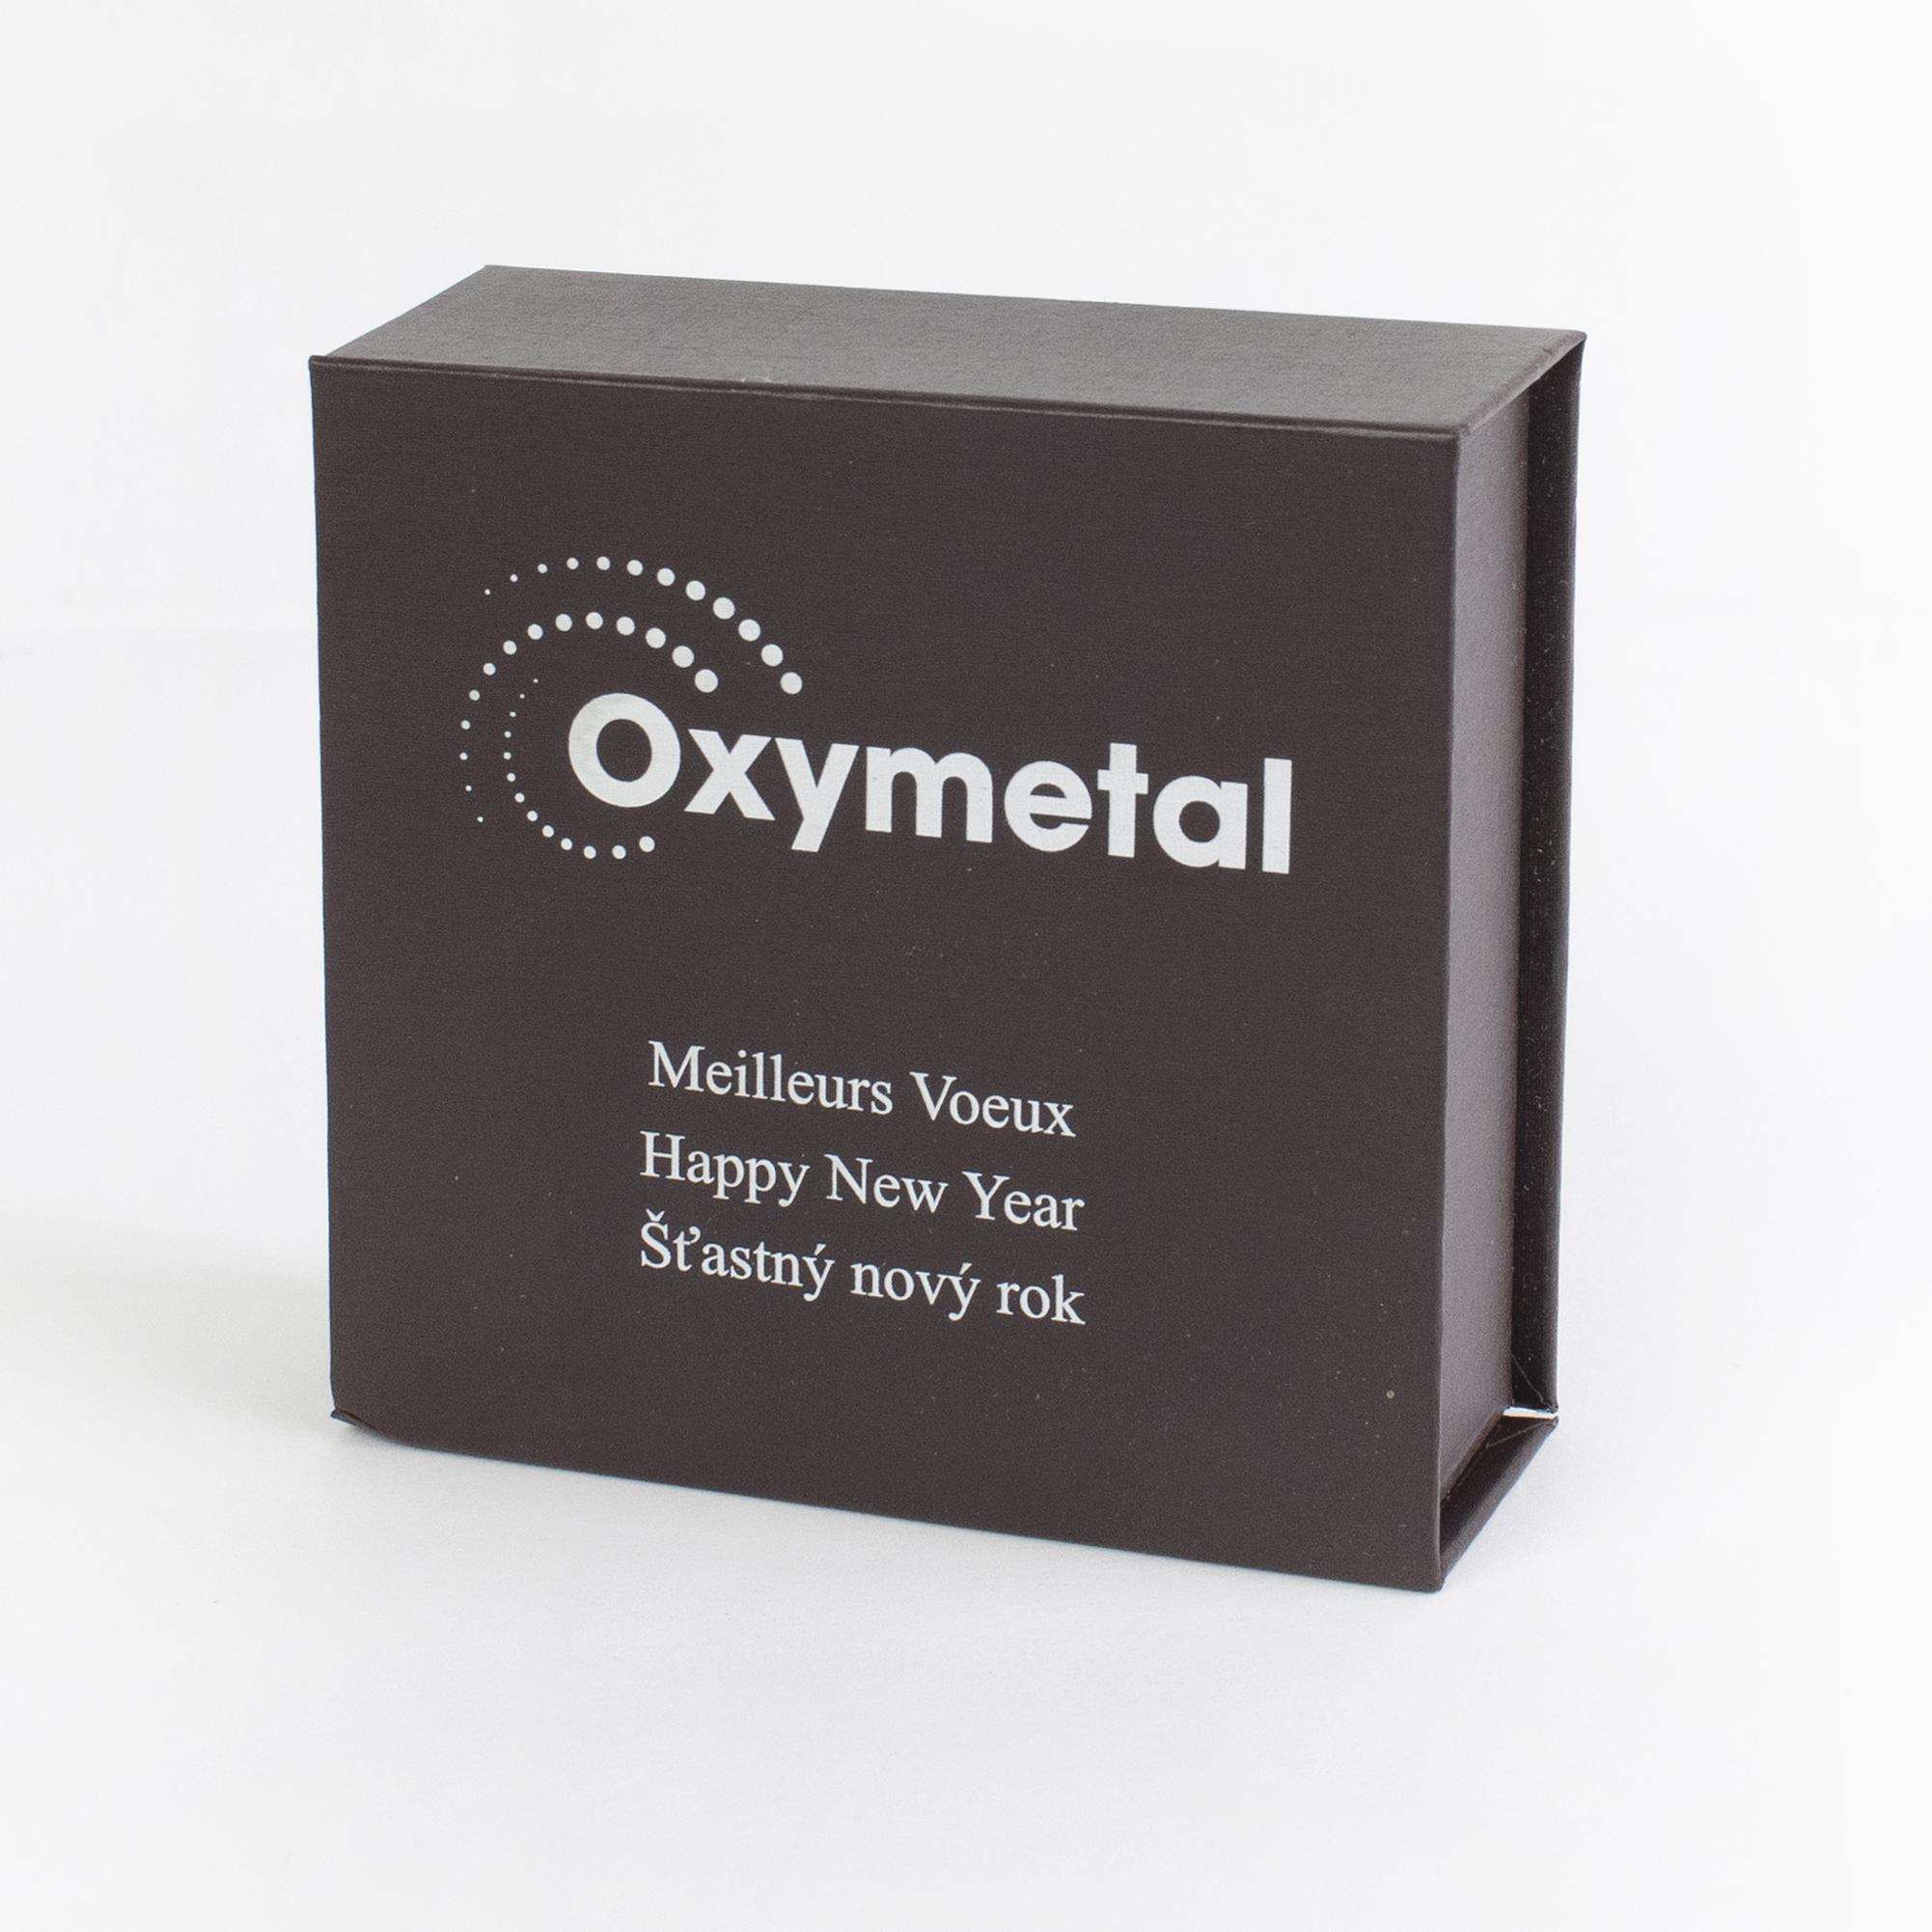 Écrin personnalisé Oxymetal.jpg